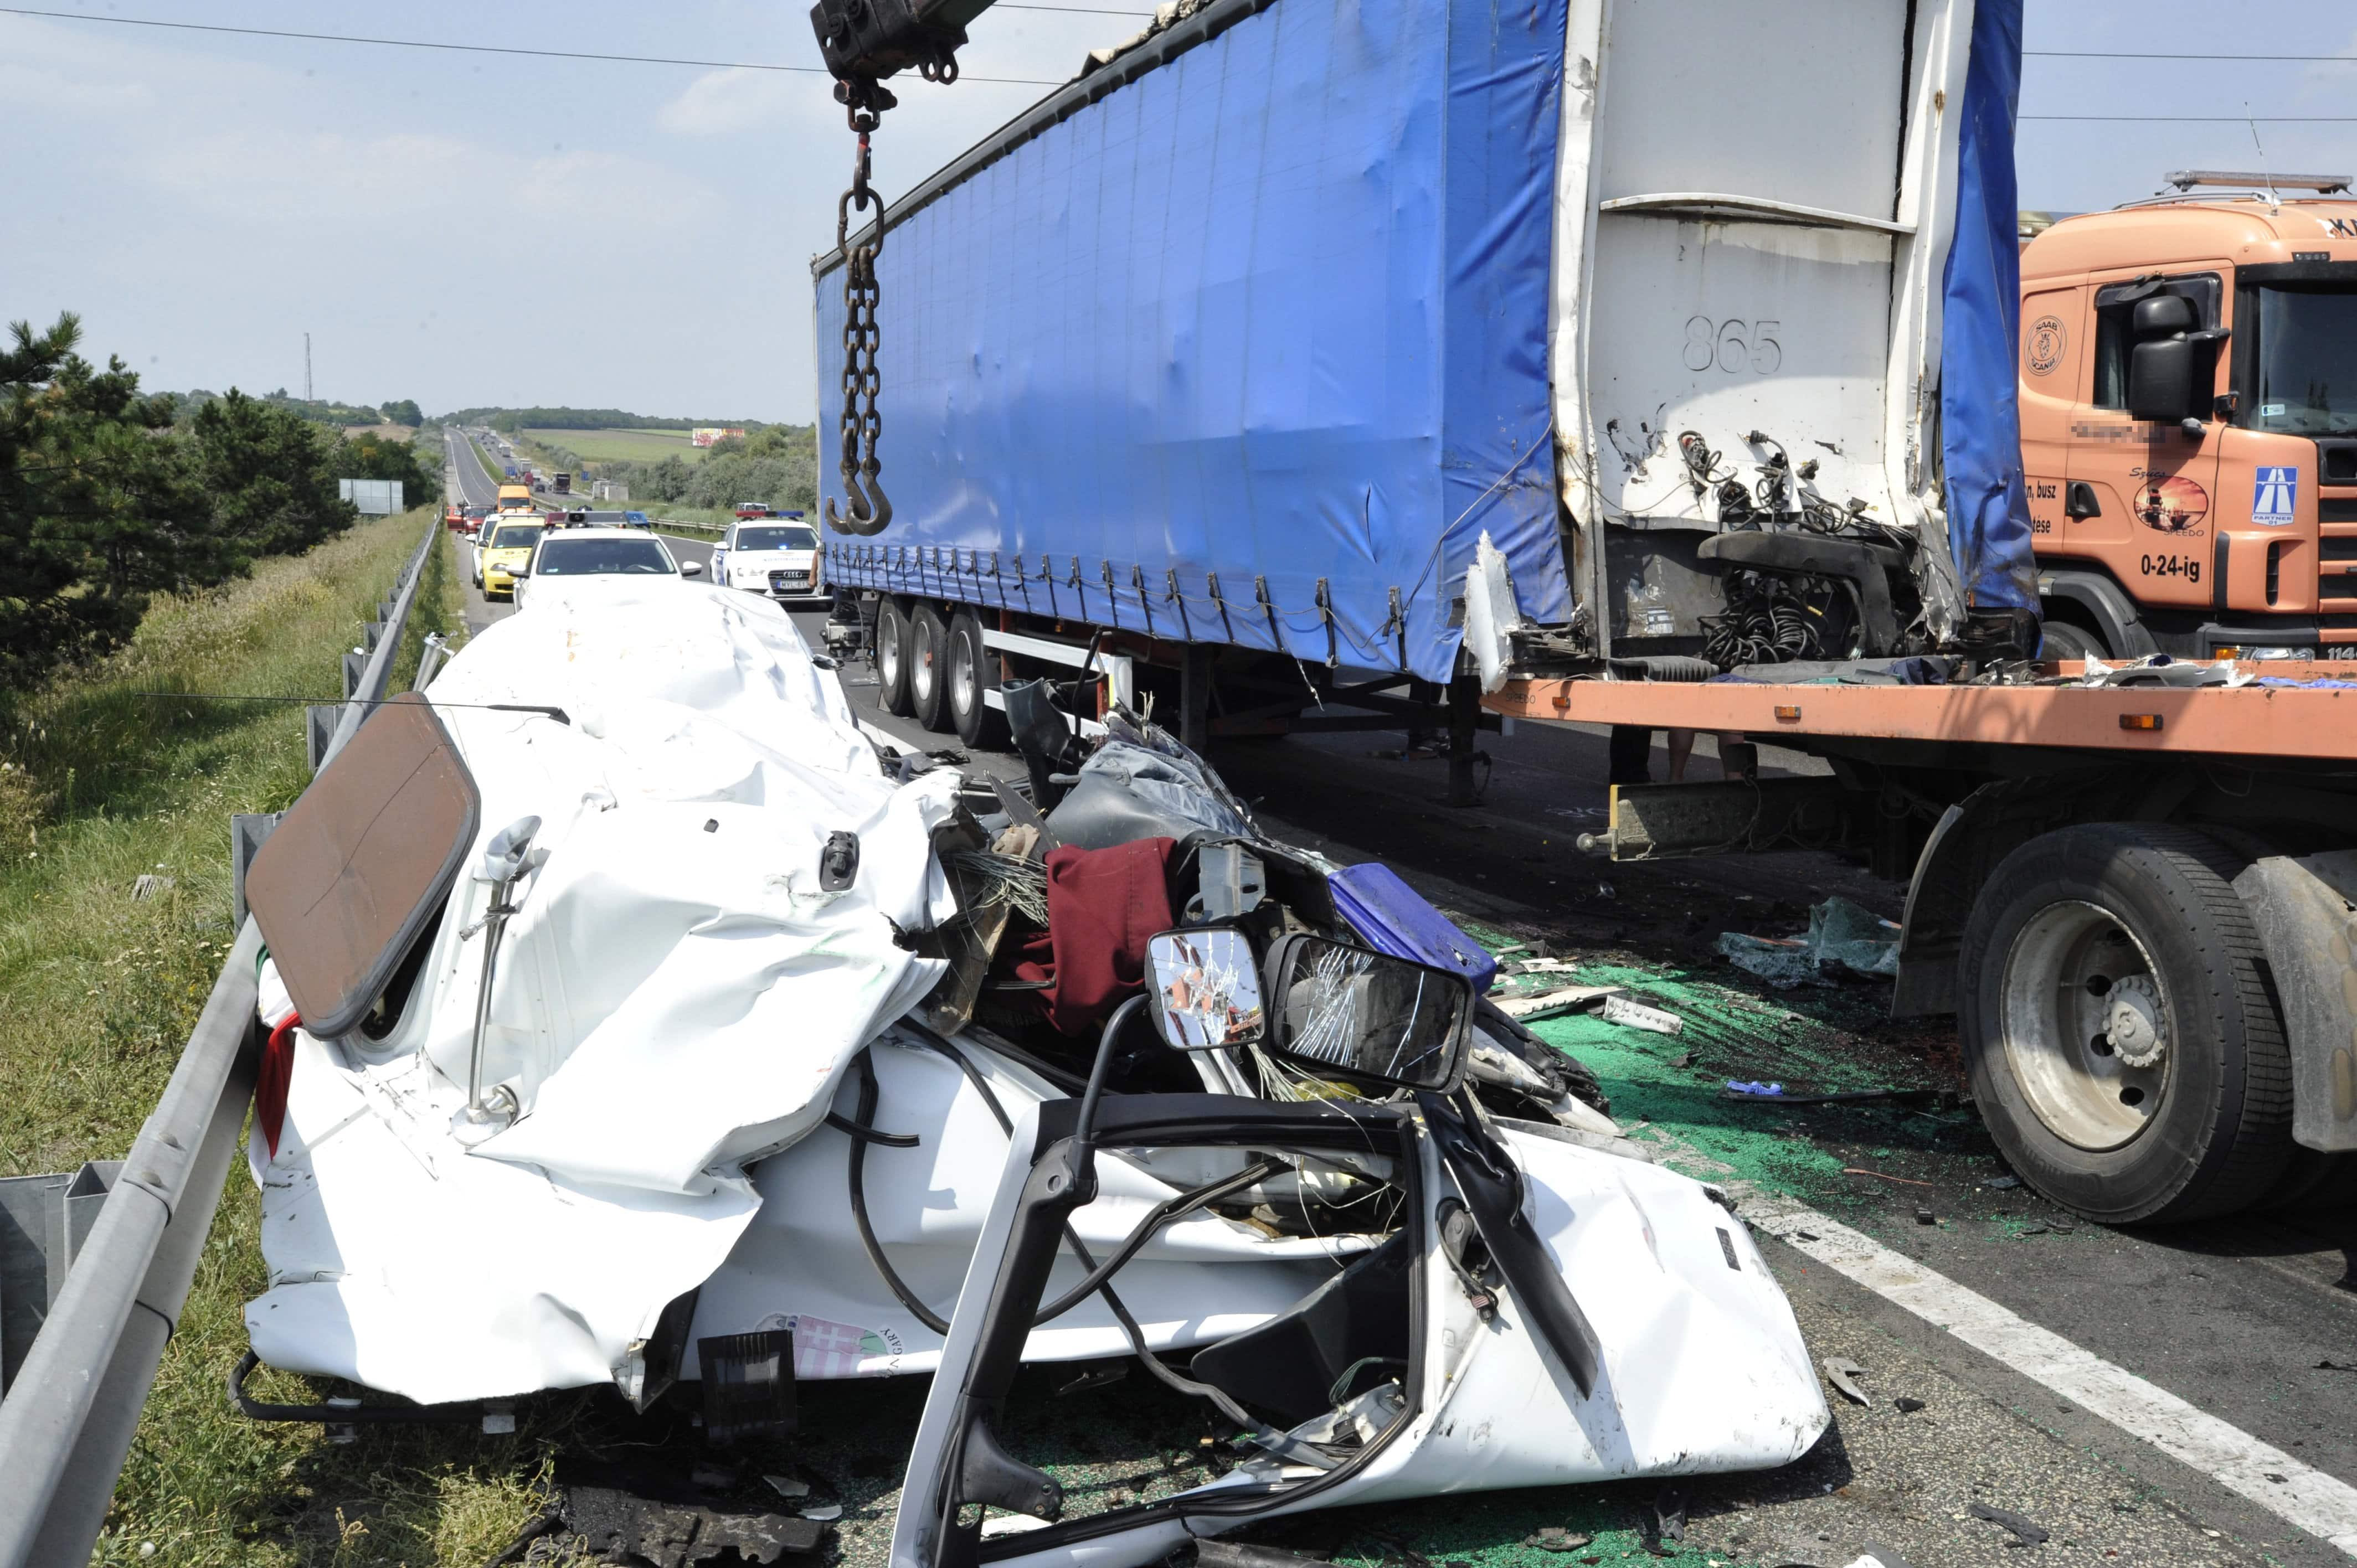 accident trucks